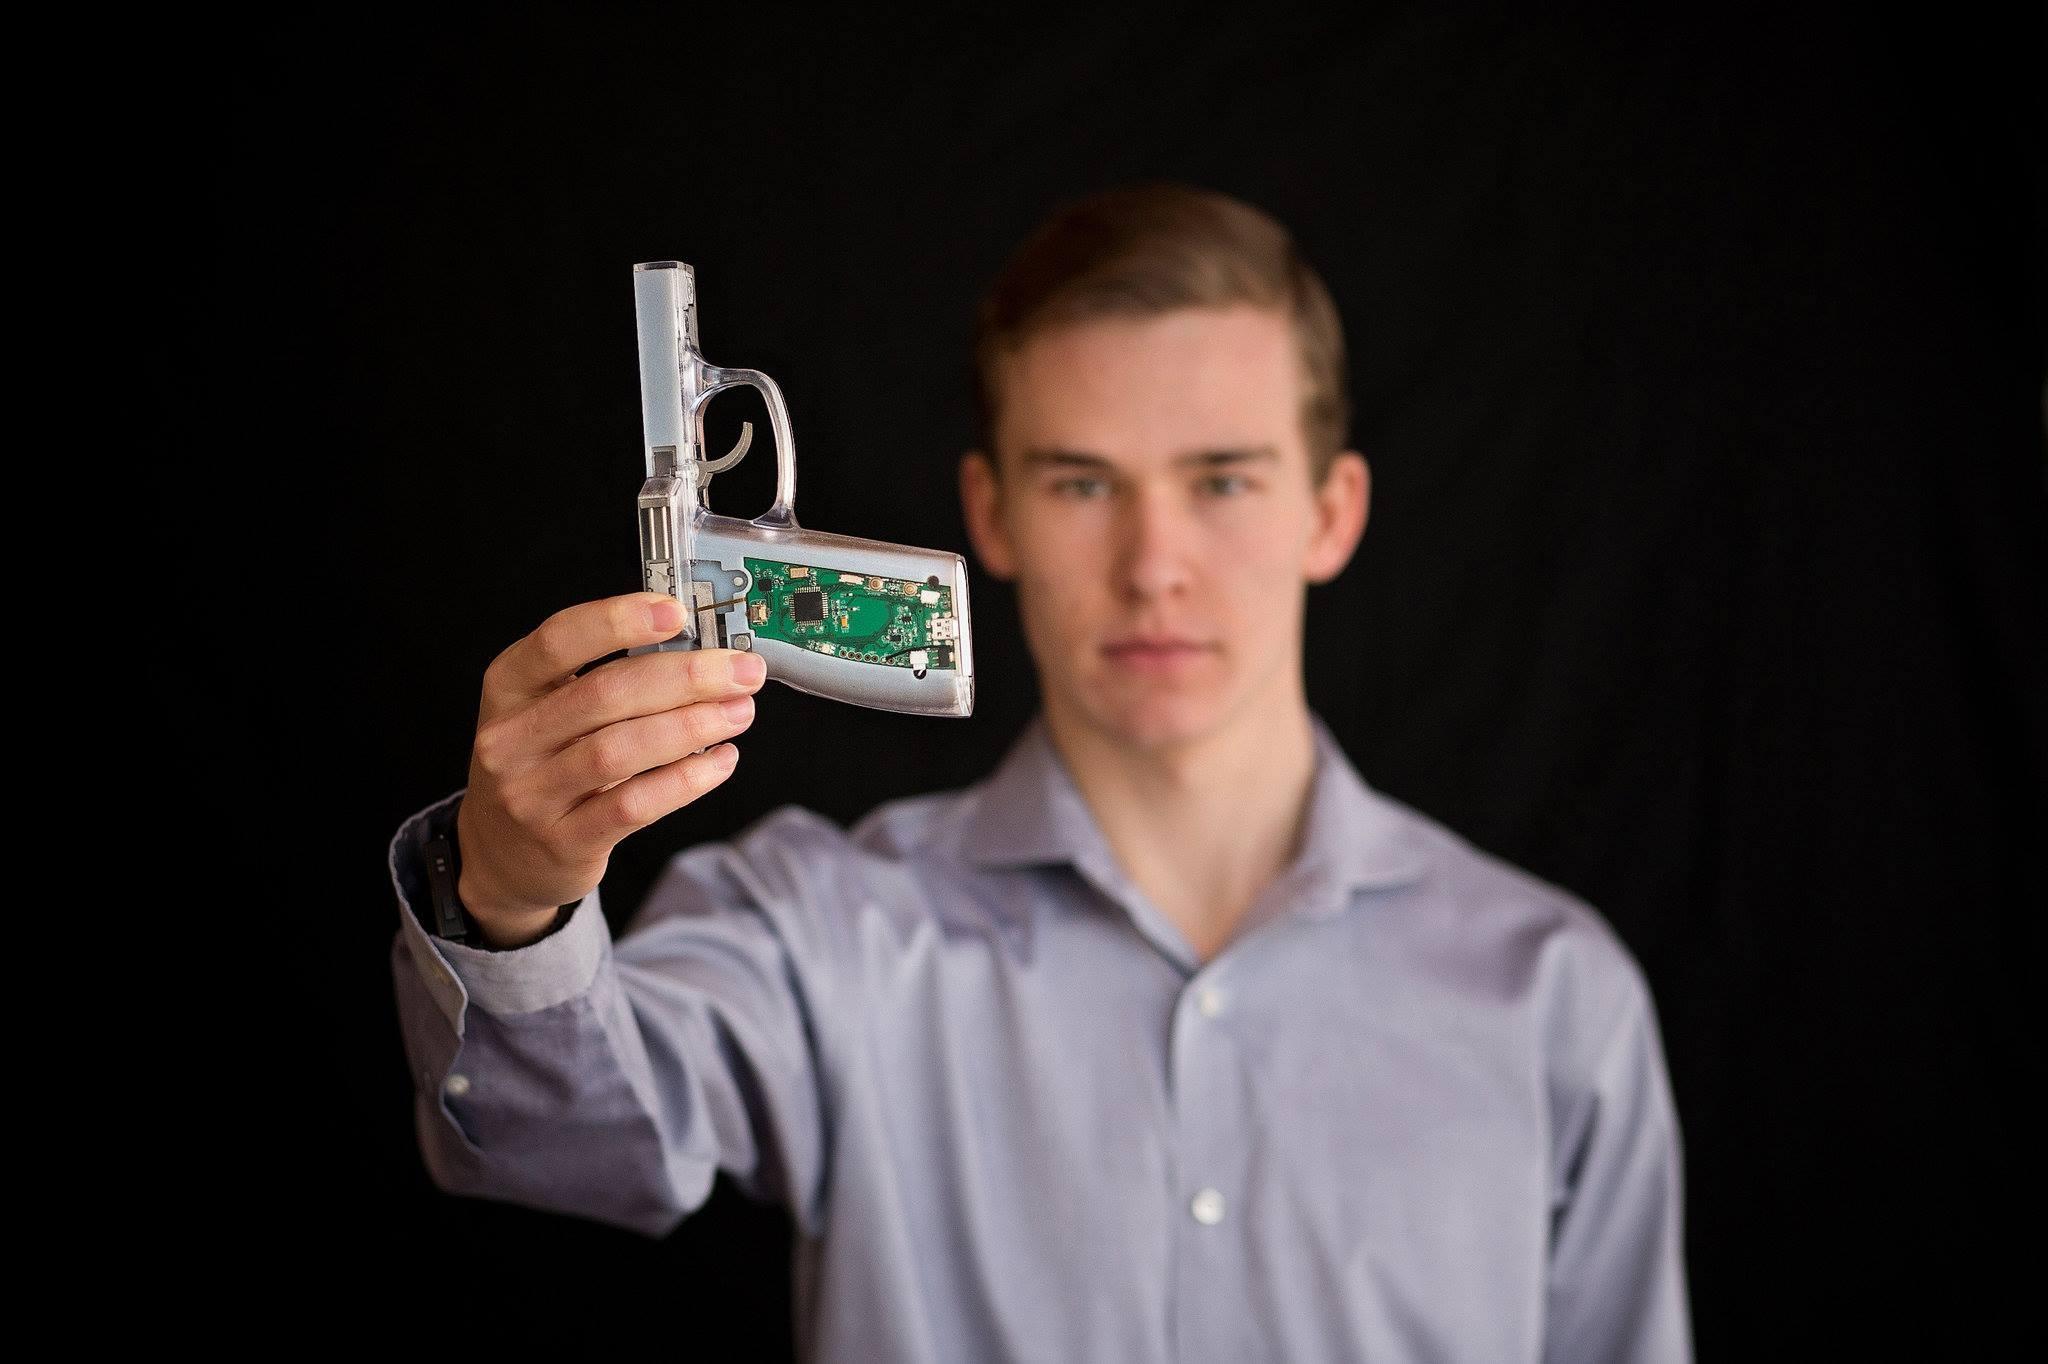 A Fingerprint Scanner For Unlocking Your Gun?